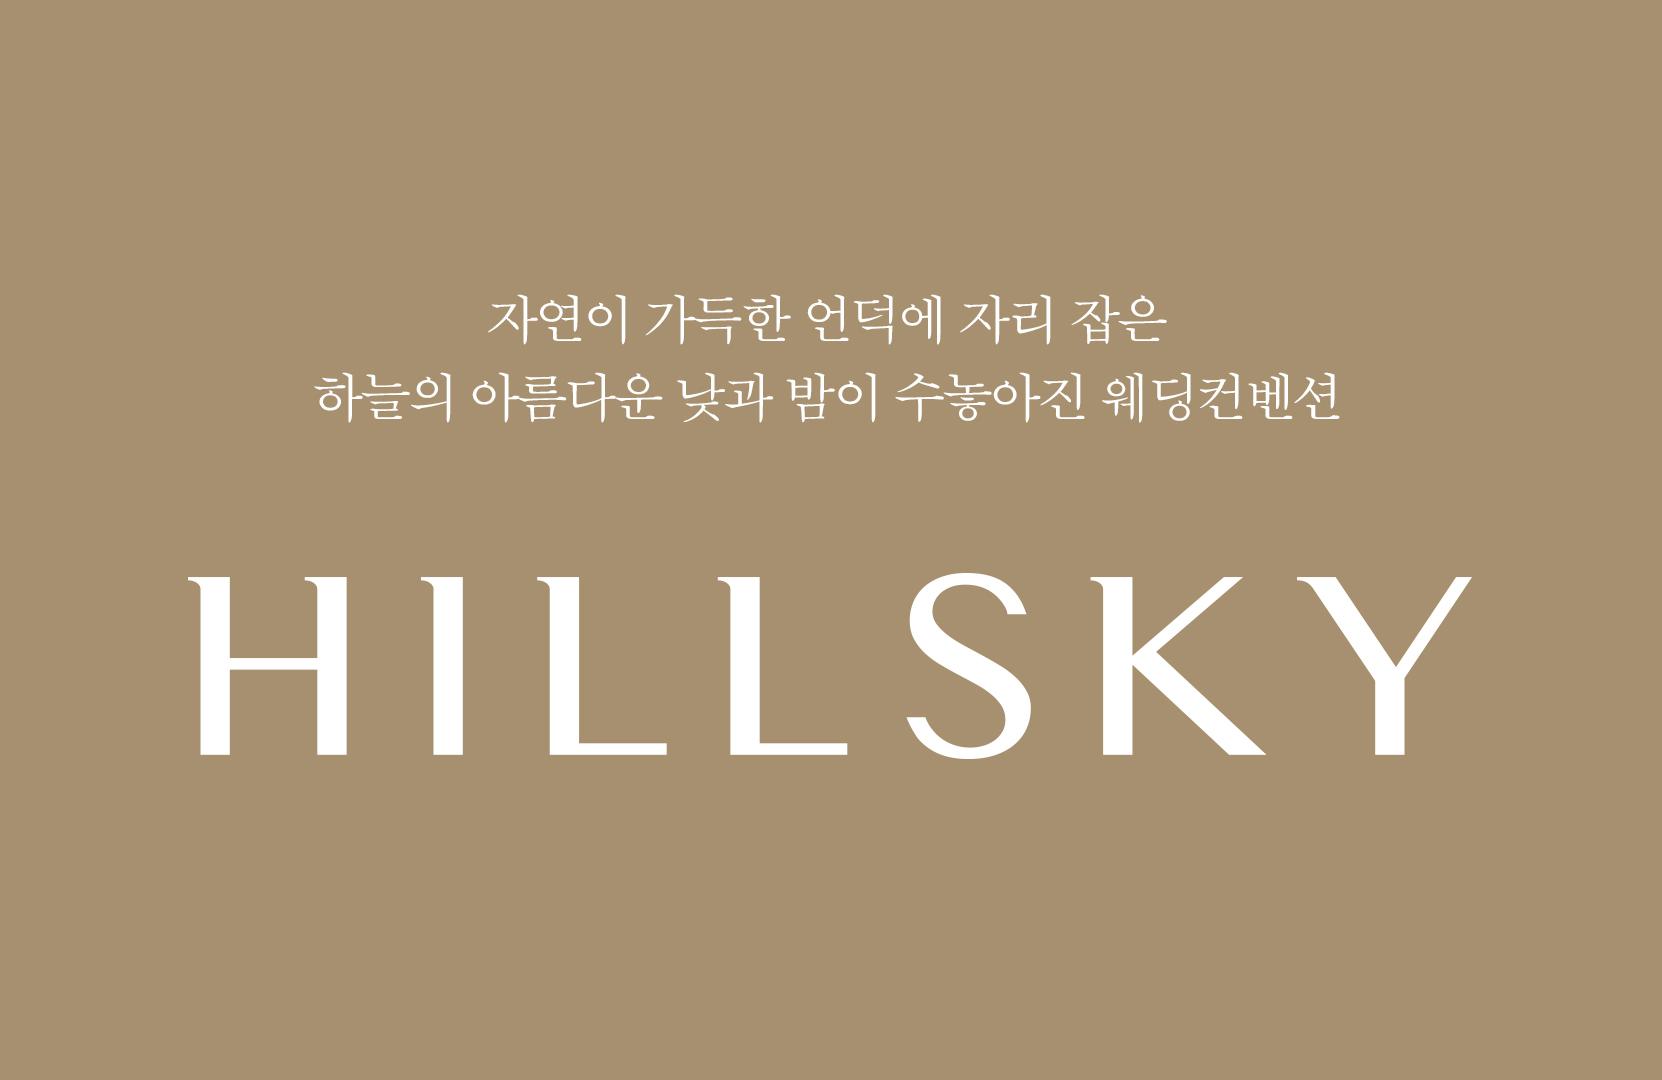 hillsky_naming2